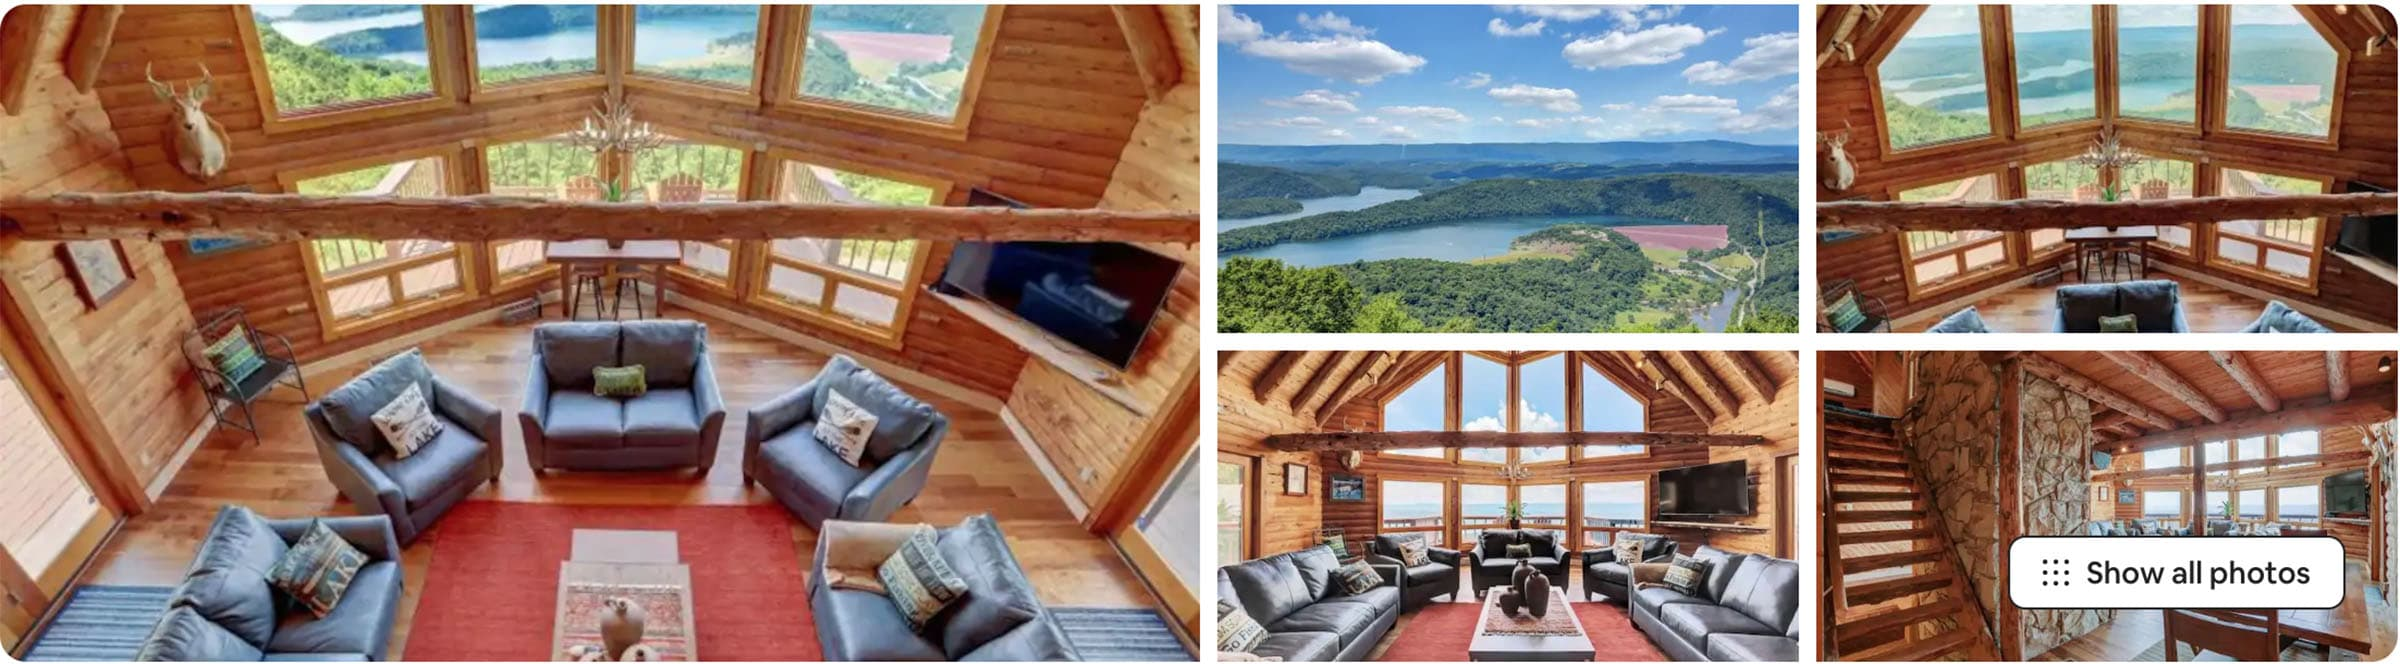 crown jewel vista lodge airbnb for wedding PA